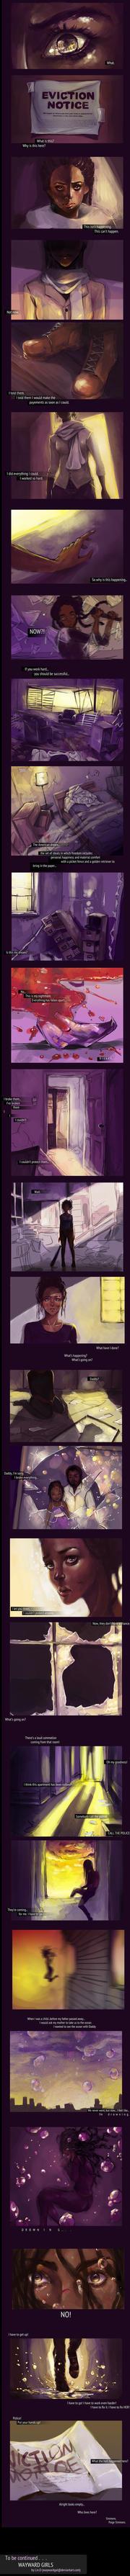 Wayward Girls: Prologue: Paige by waywardgal